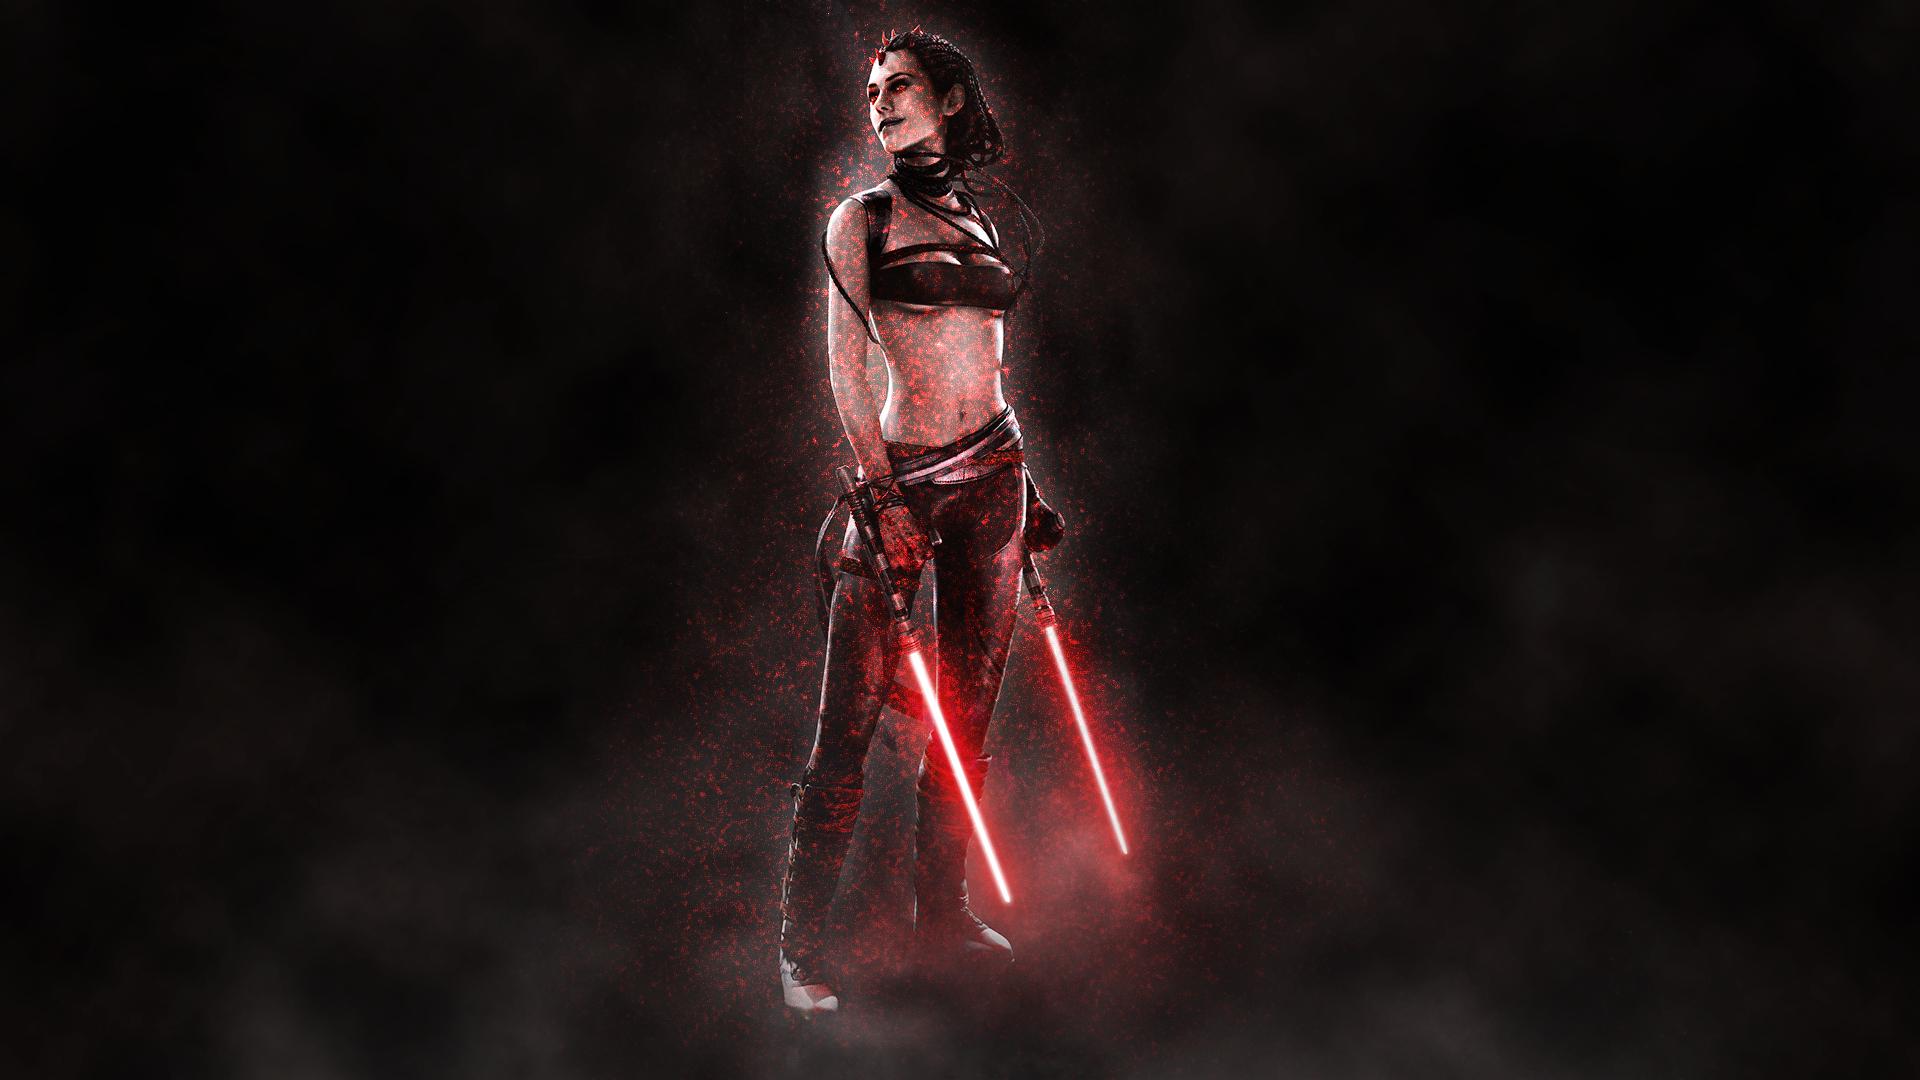 Star Wars Sith Girl Wallpaper By Aidenpearce5 On Deviantart